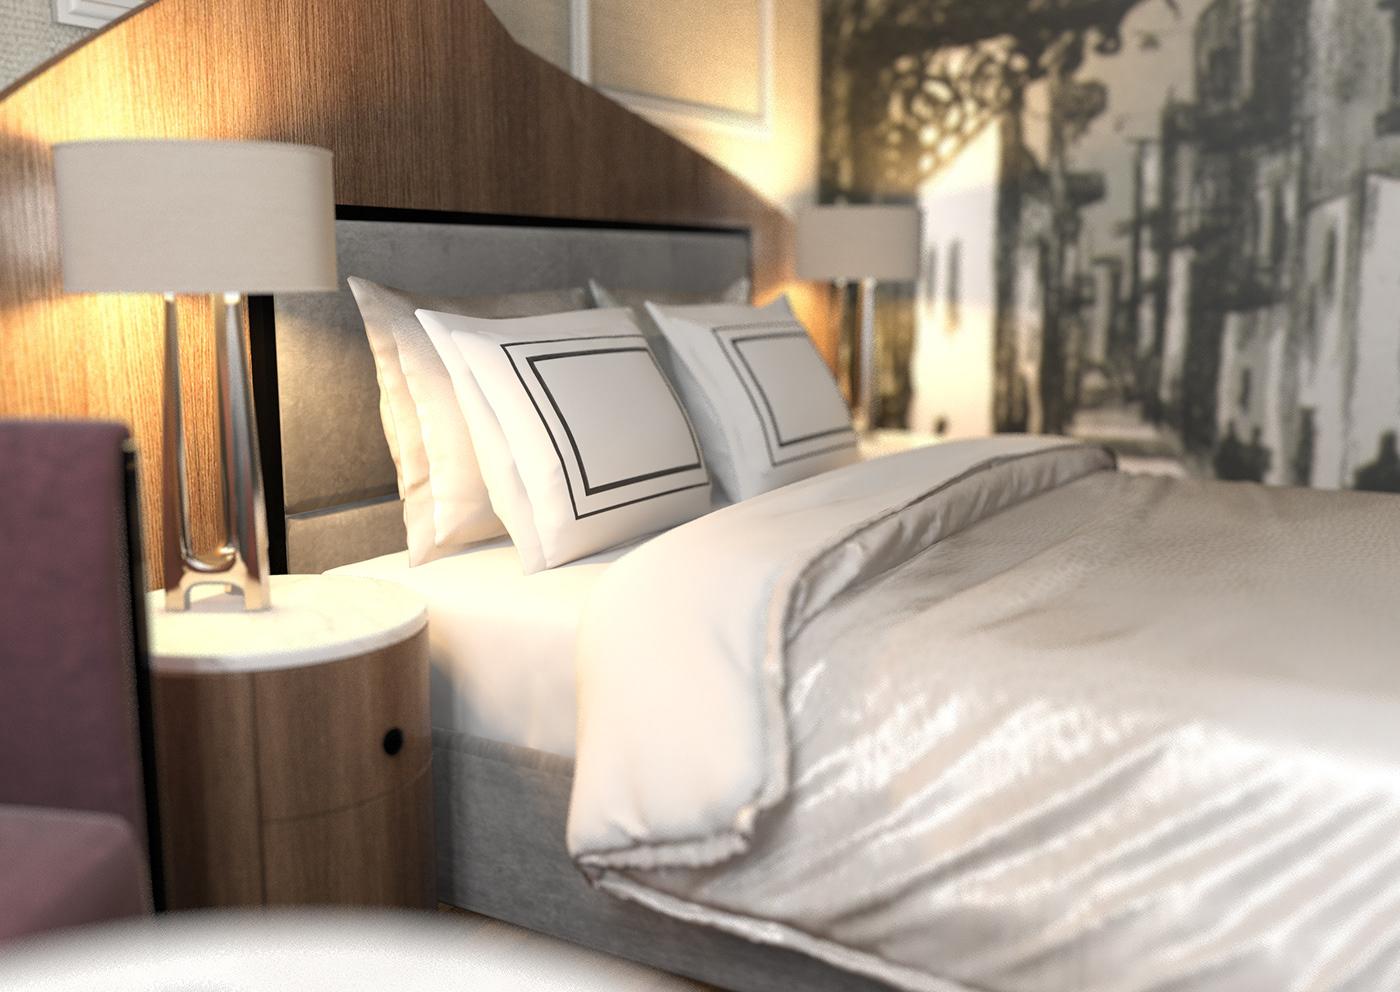 design Hospitality hotel room Interior